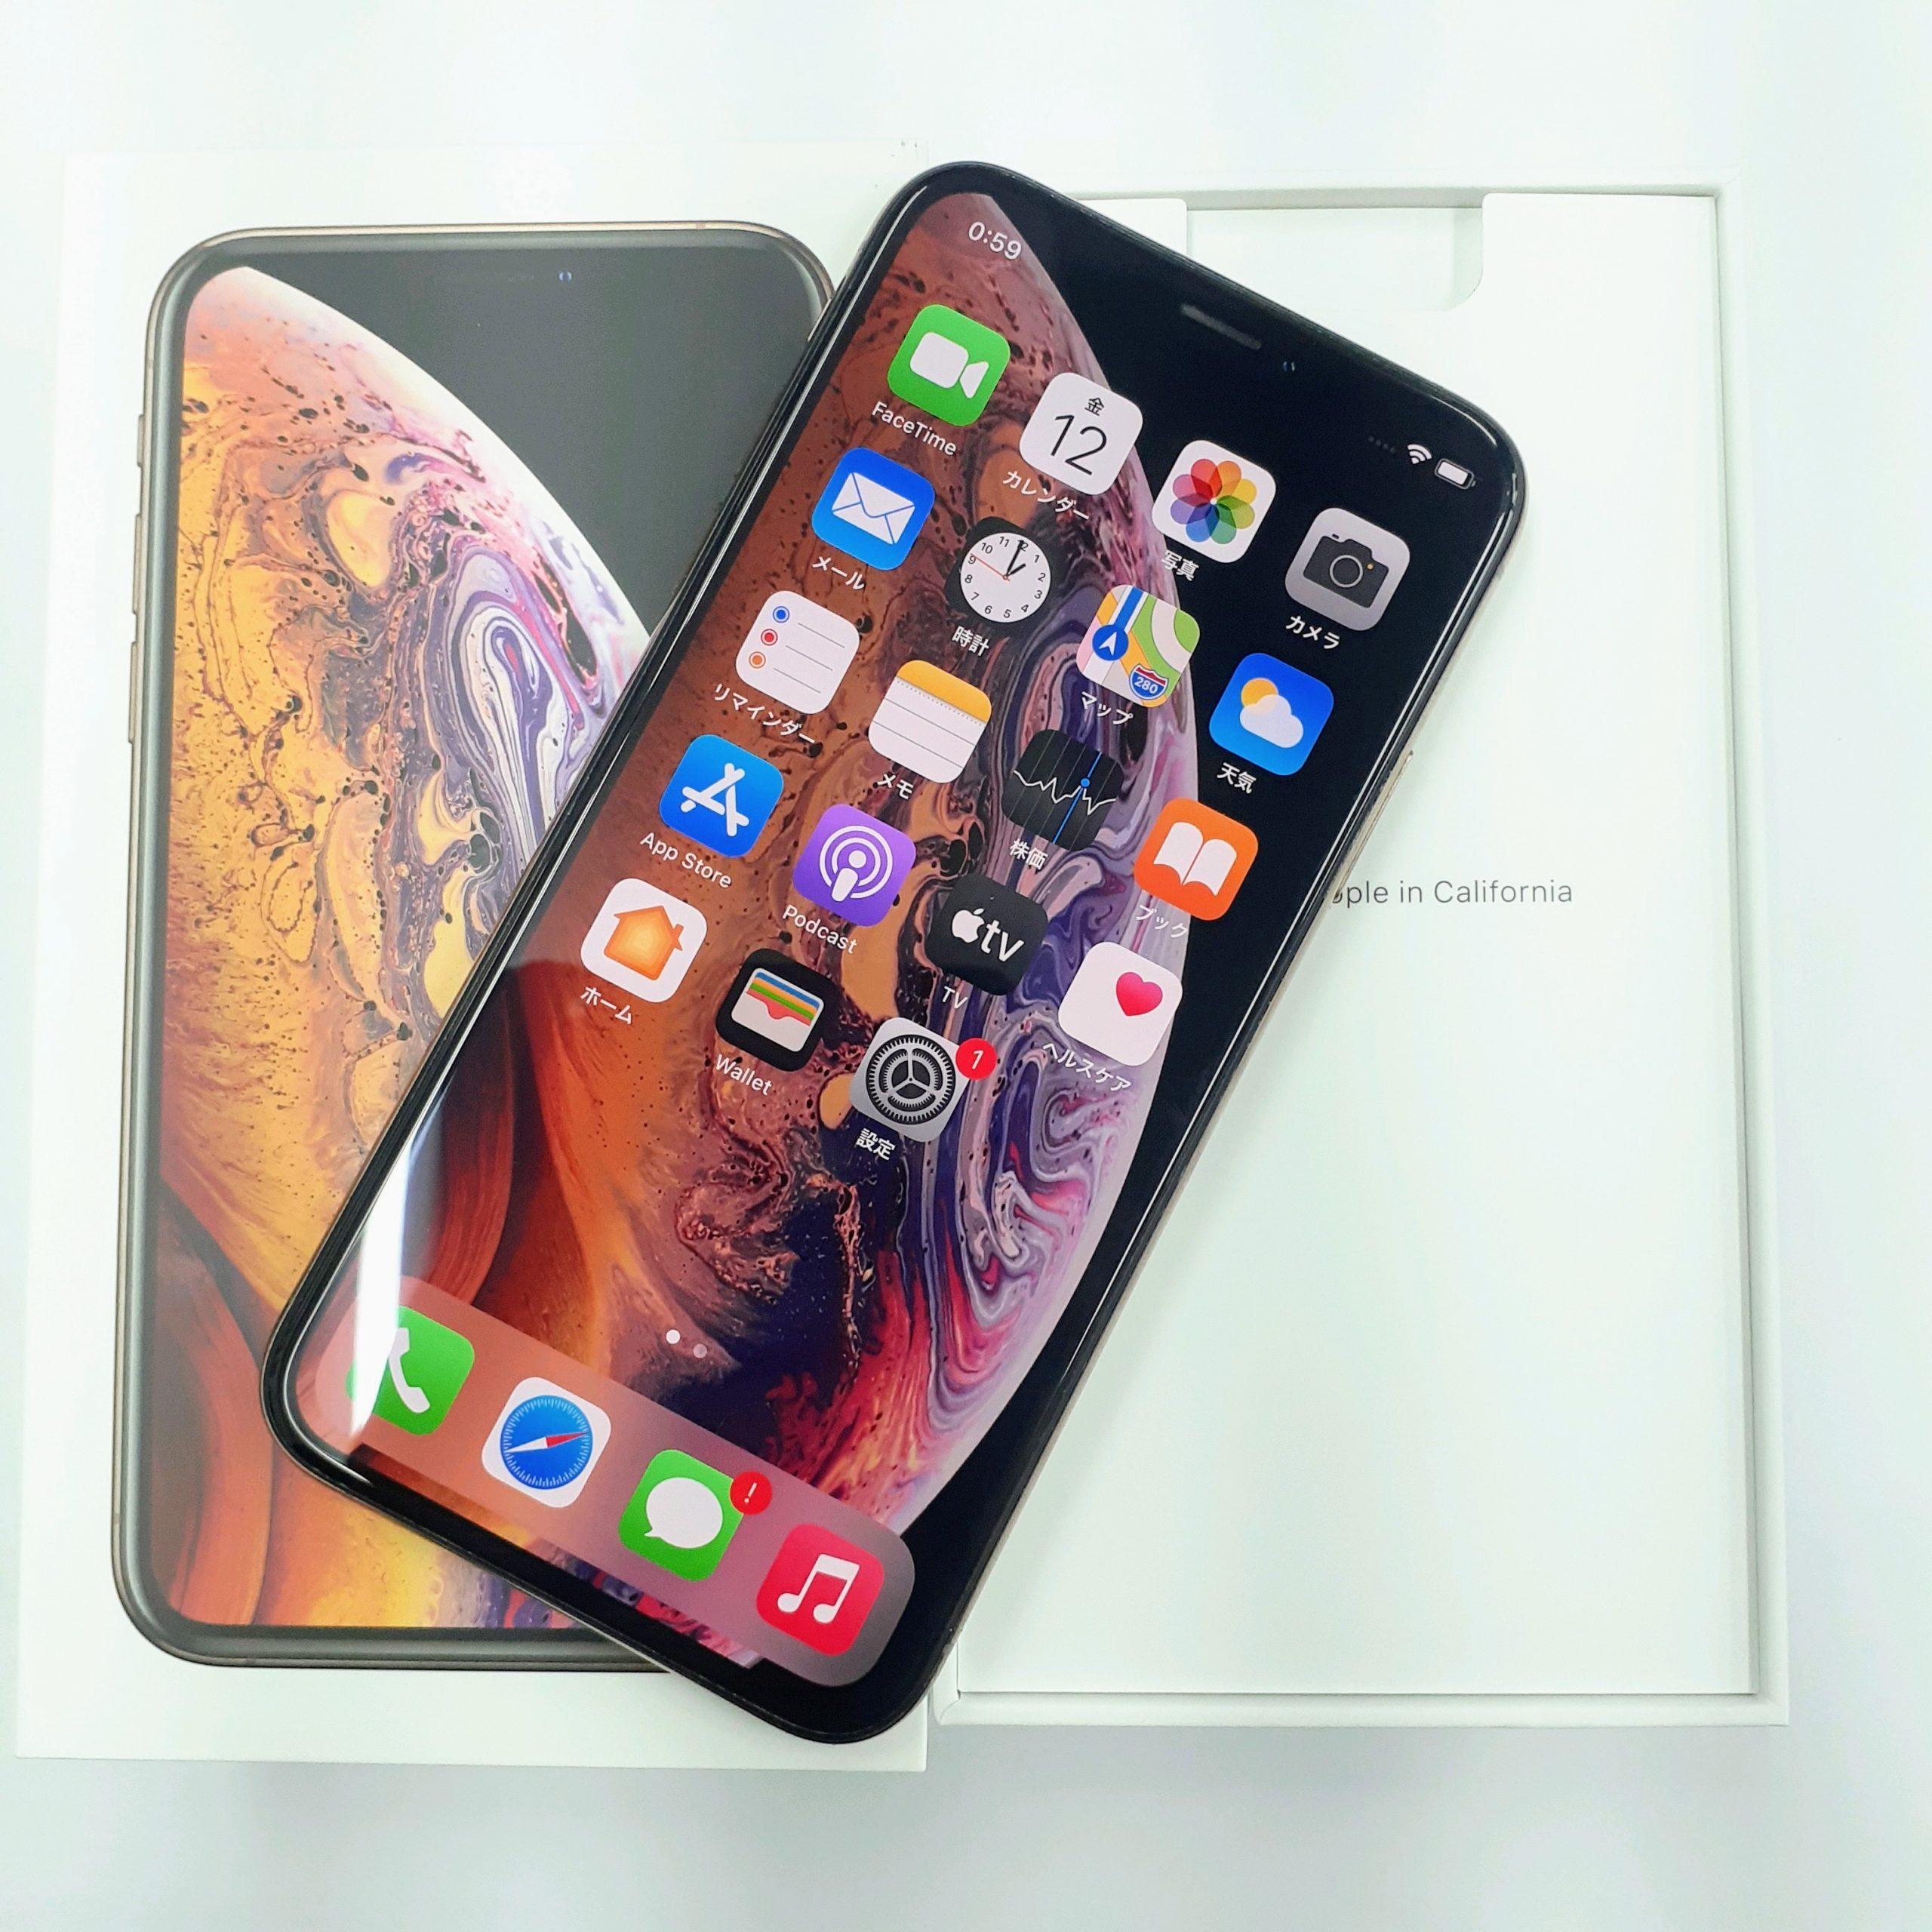 iPhoneXR 256GB ゴールド(○判定 Bランク)